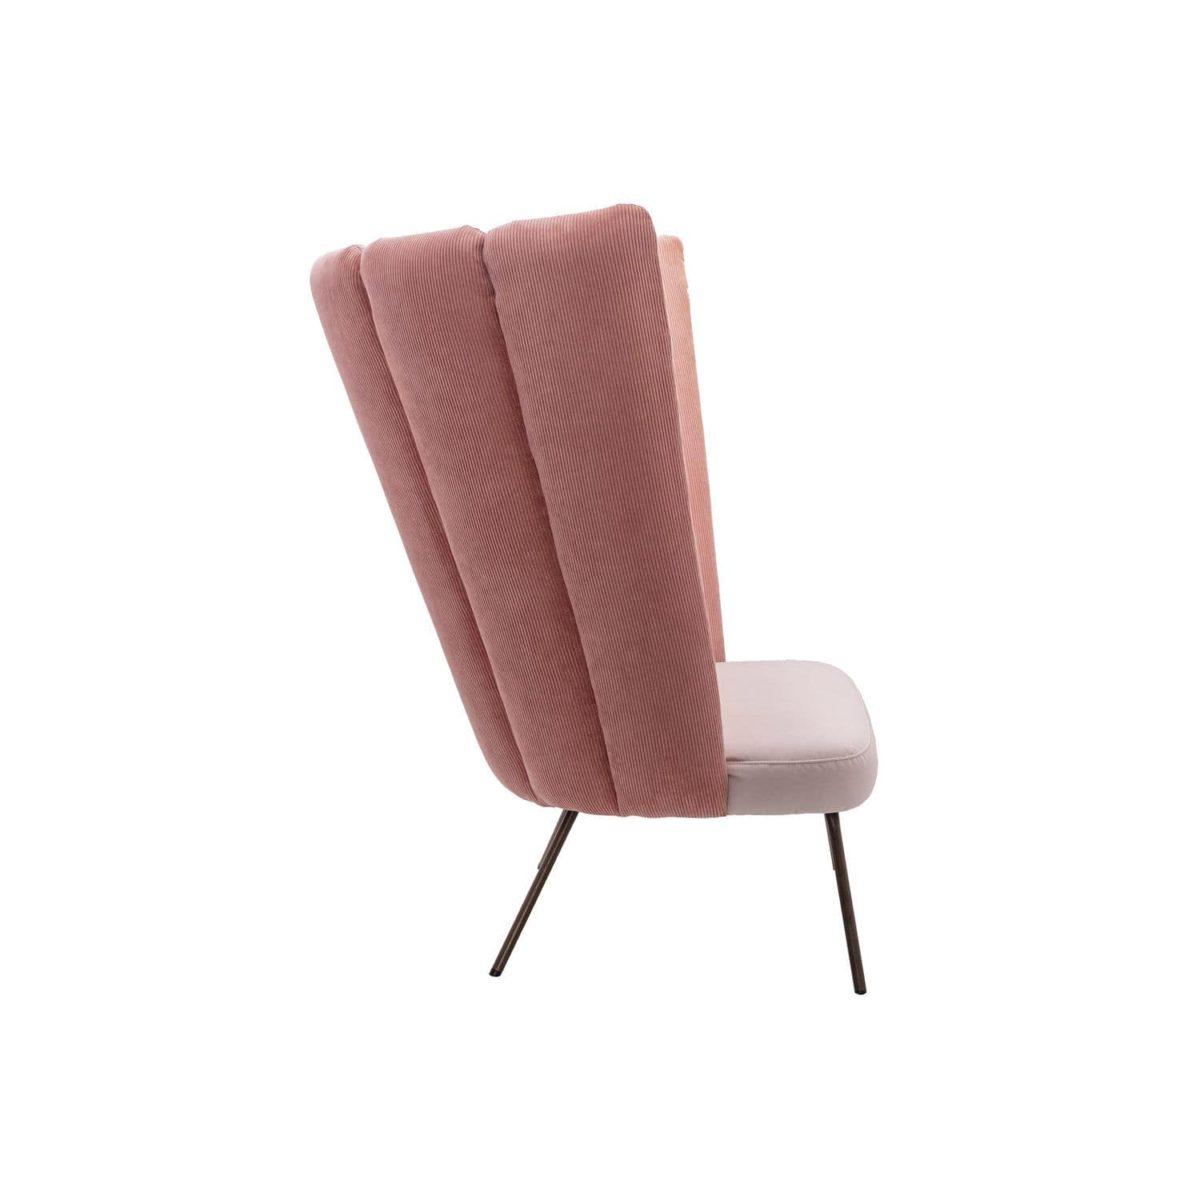 67498 14235235 1200x1200 - Fotoliu Gaia Calice Lounge KFF